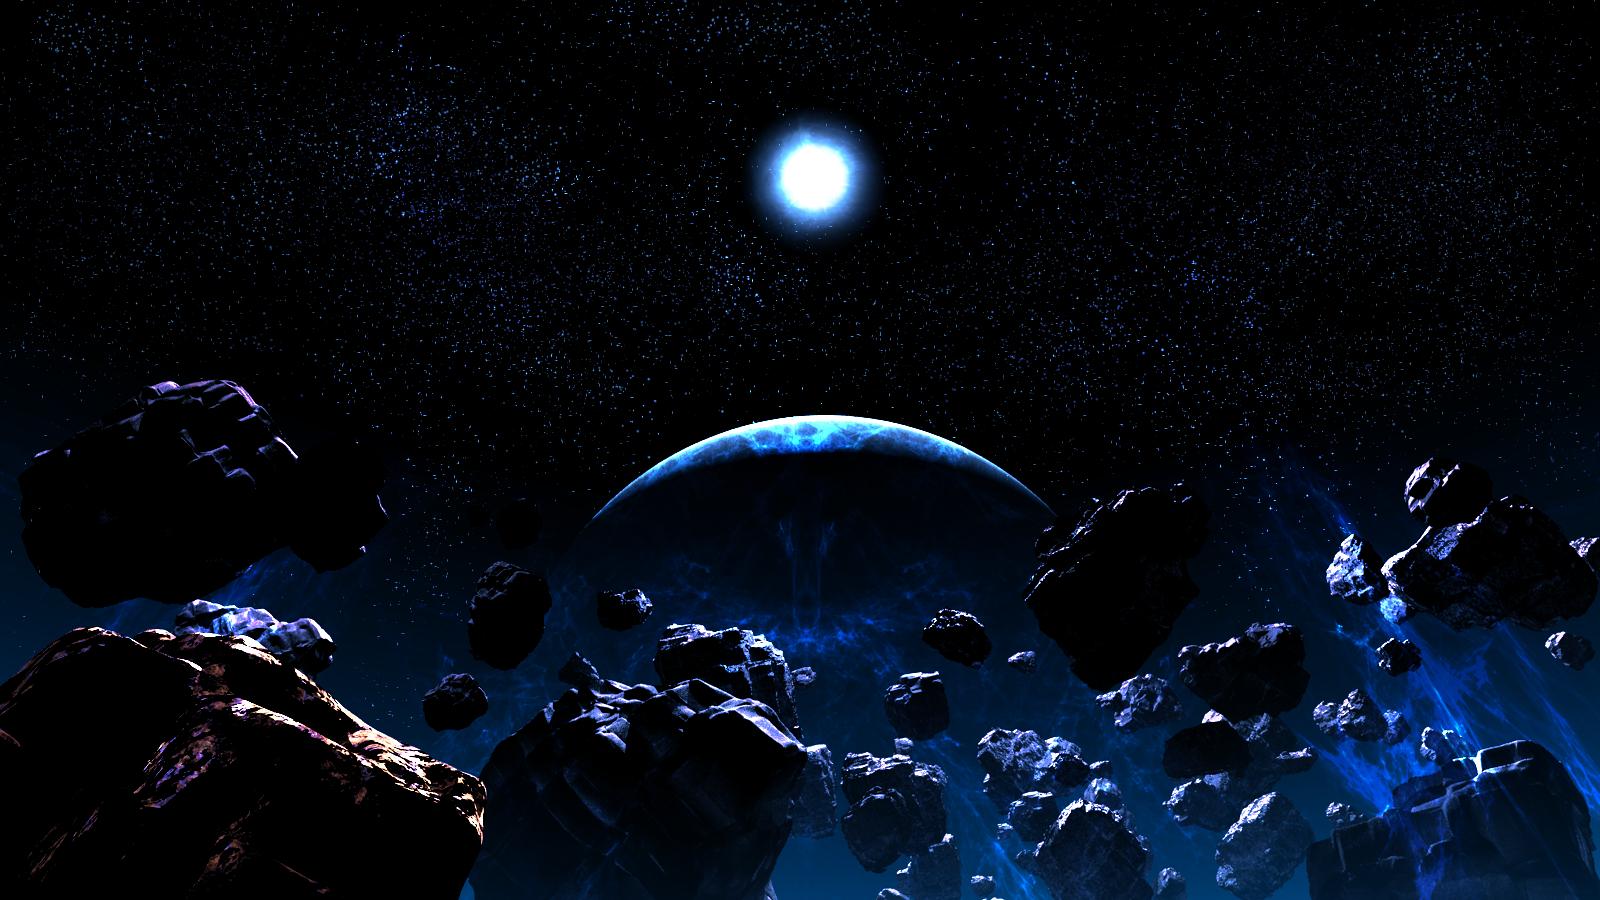 scenic sky space stars y k wallpaper 1600x900 113037 WallpaperUP 1600x900